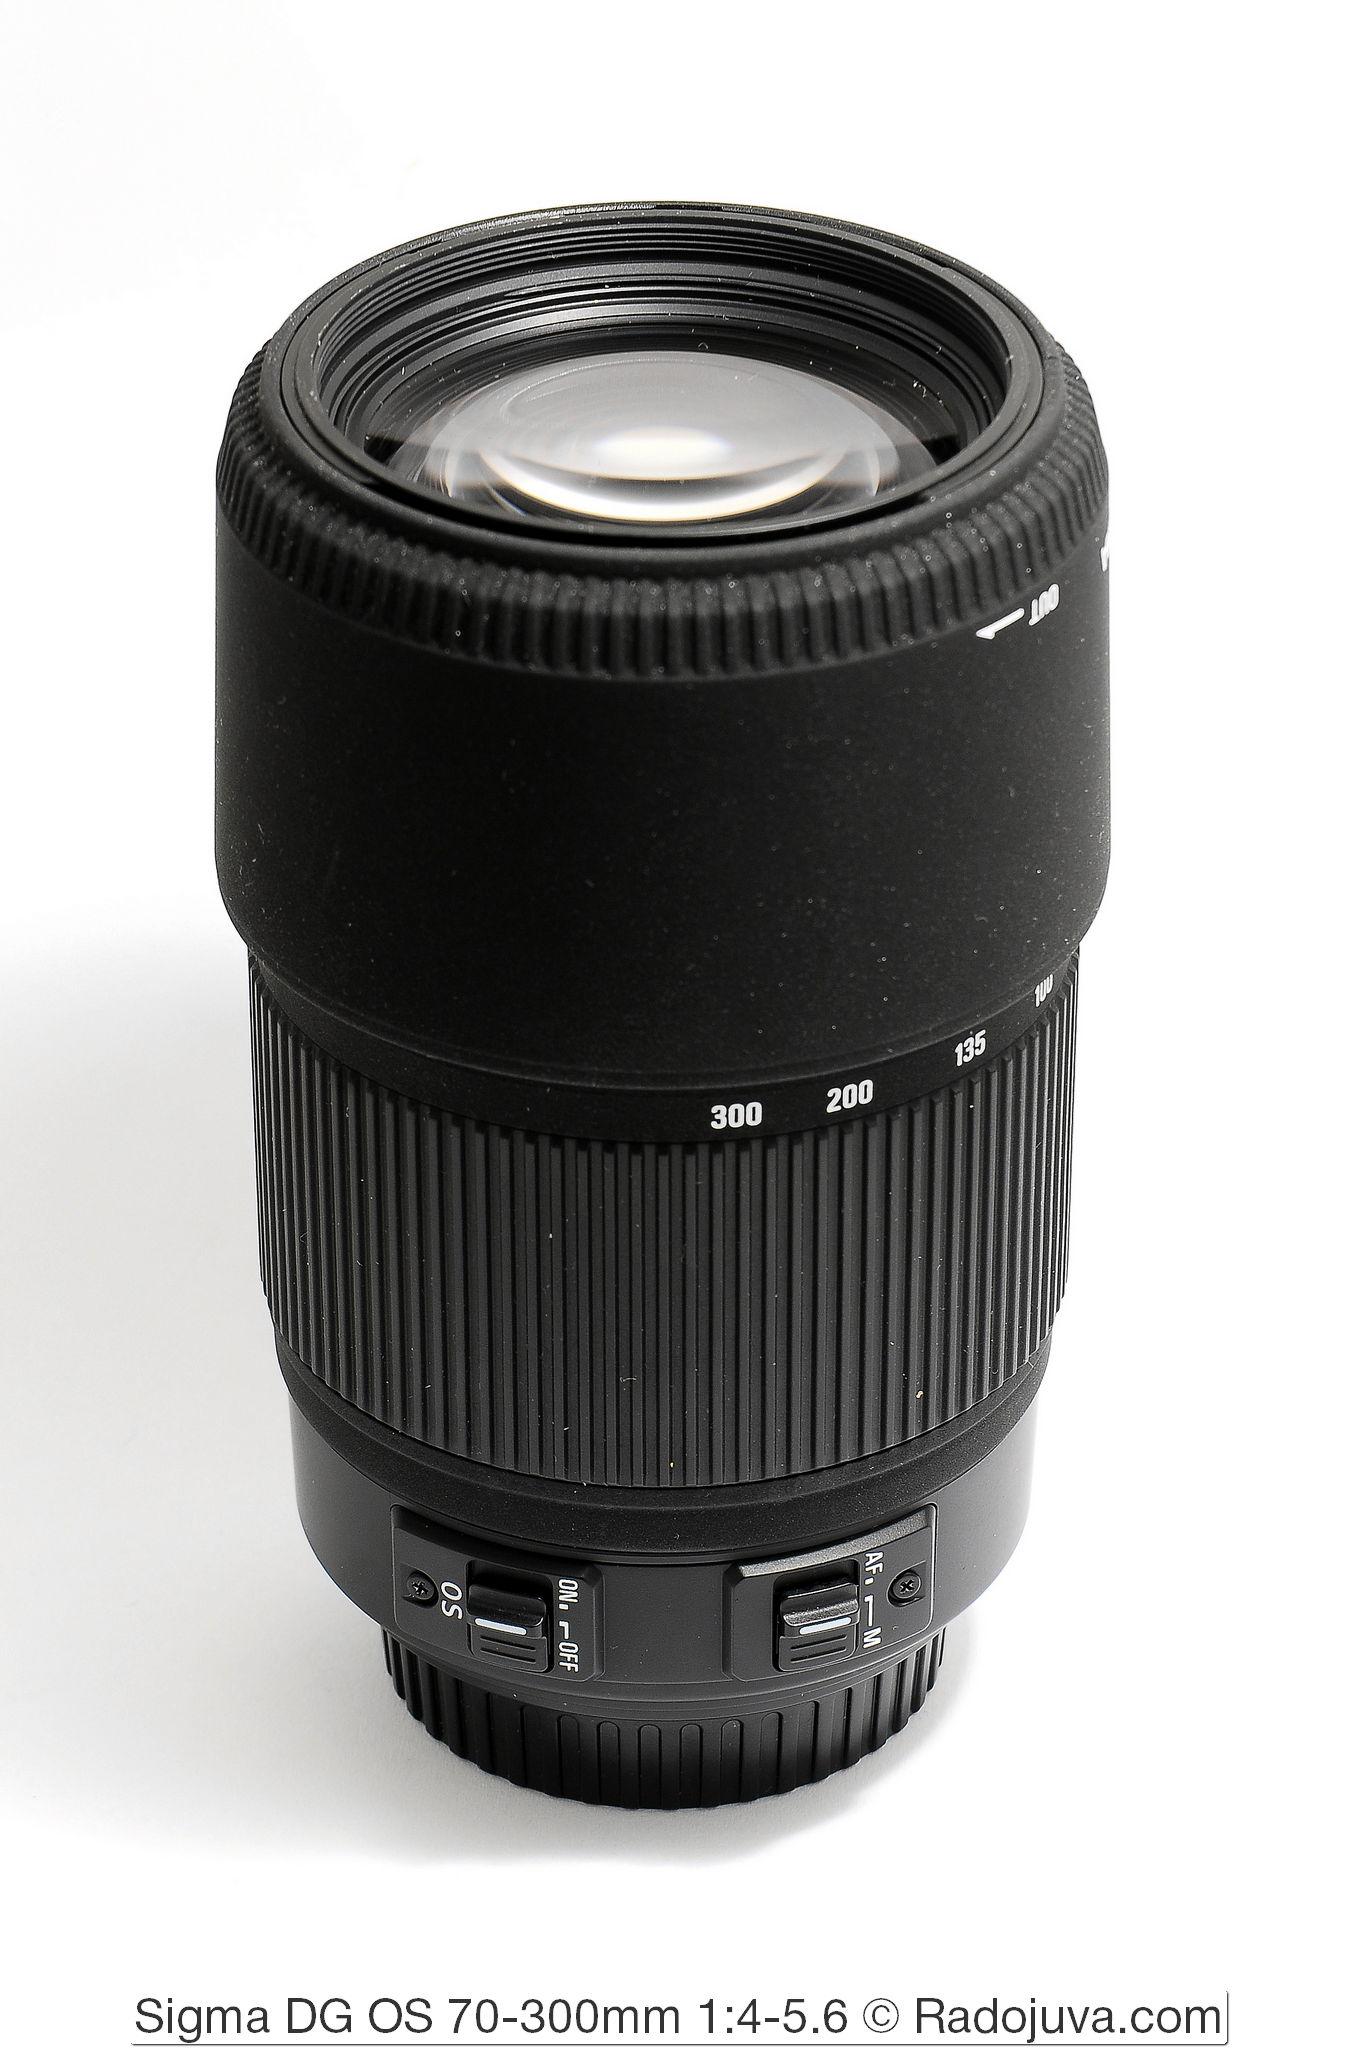 Sigma DG OS 70-300mm 1:4-5.6